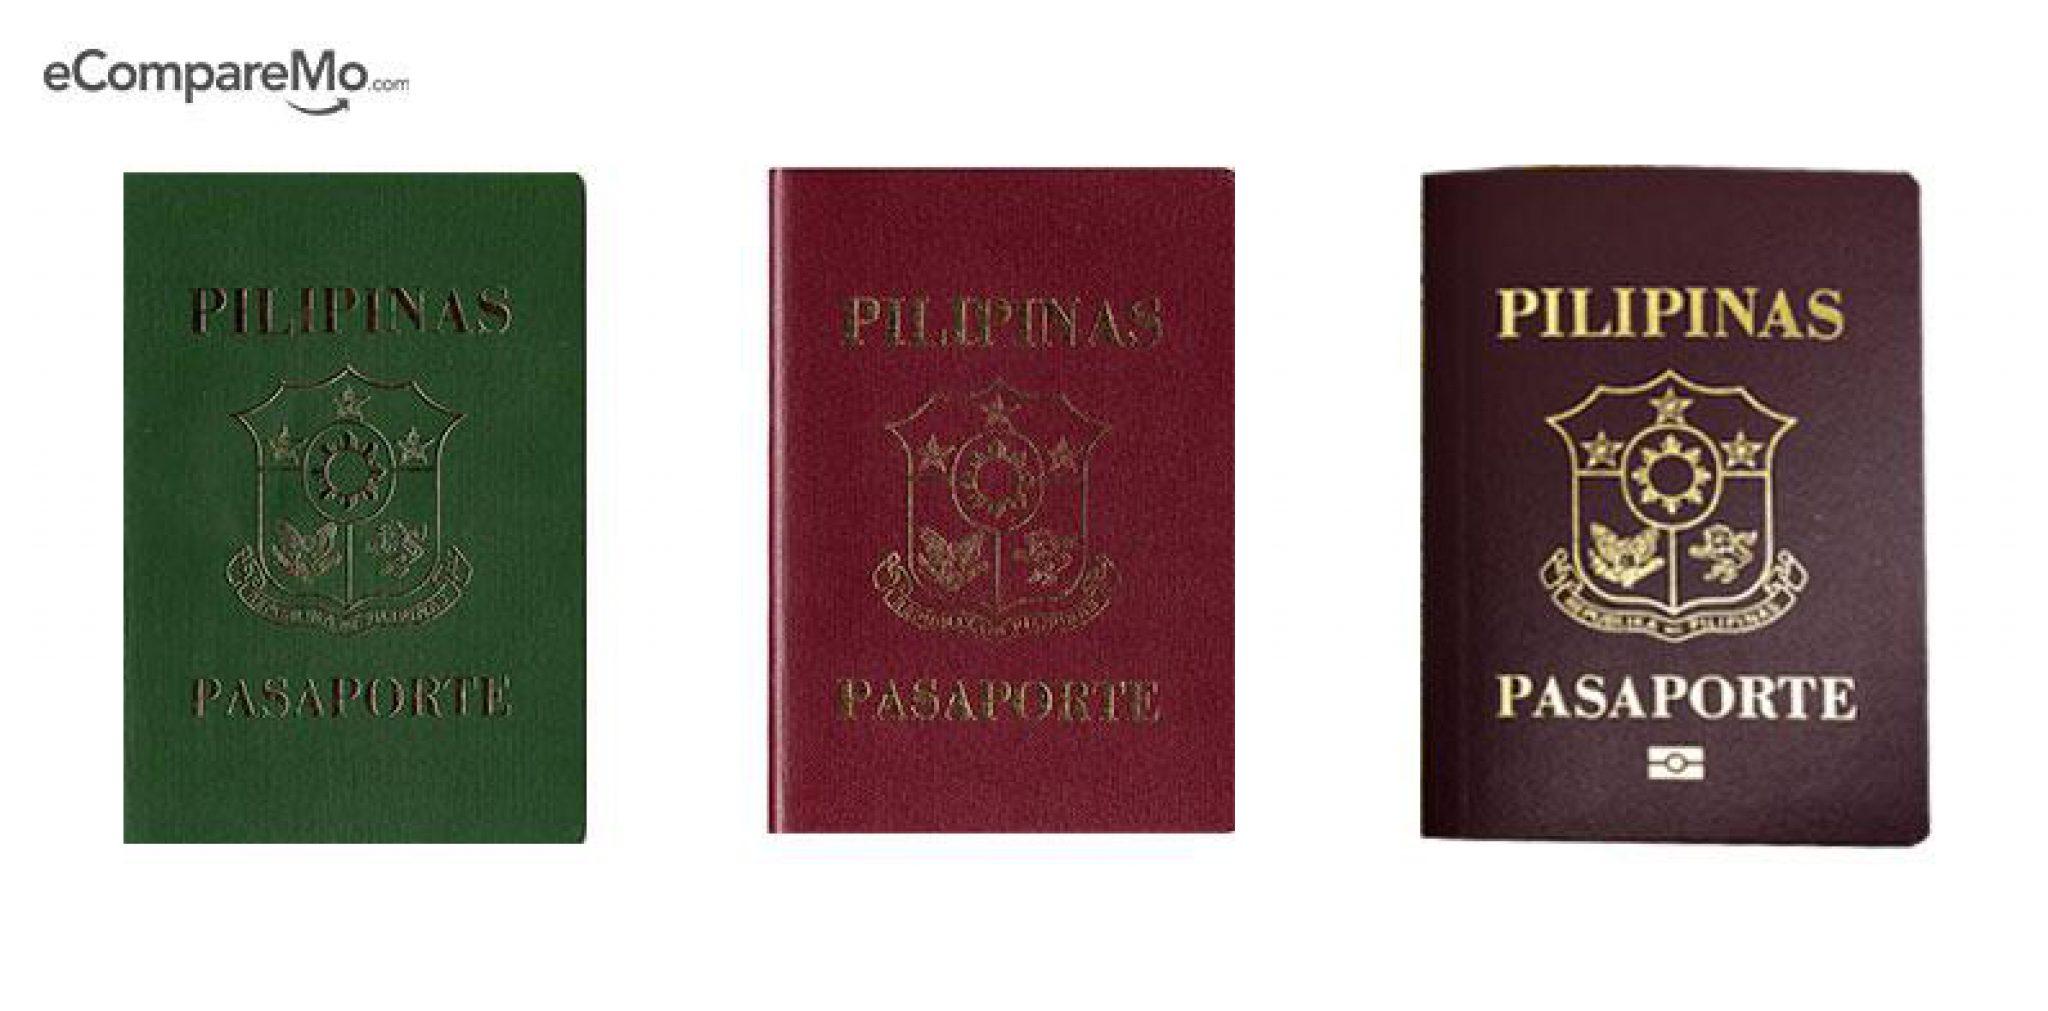 Passport Data Leak